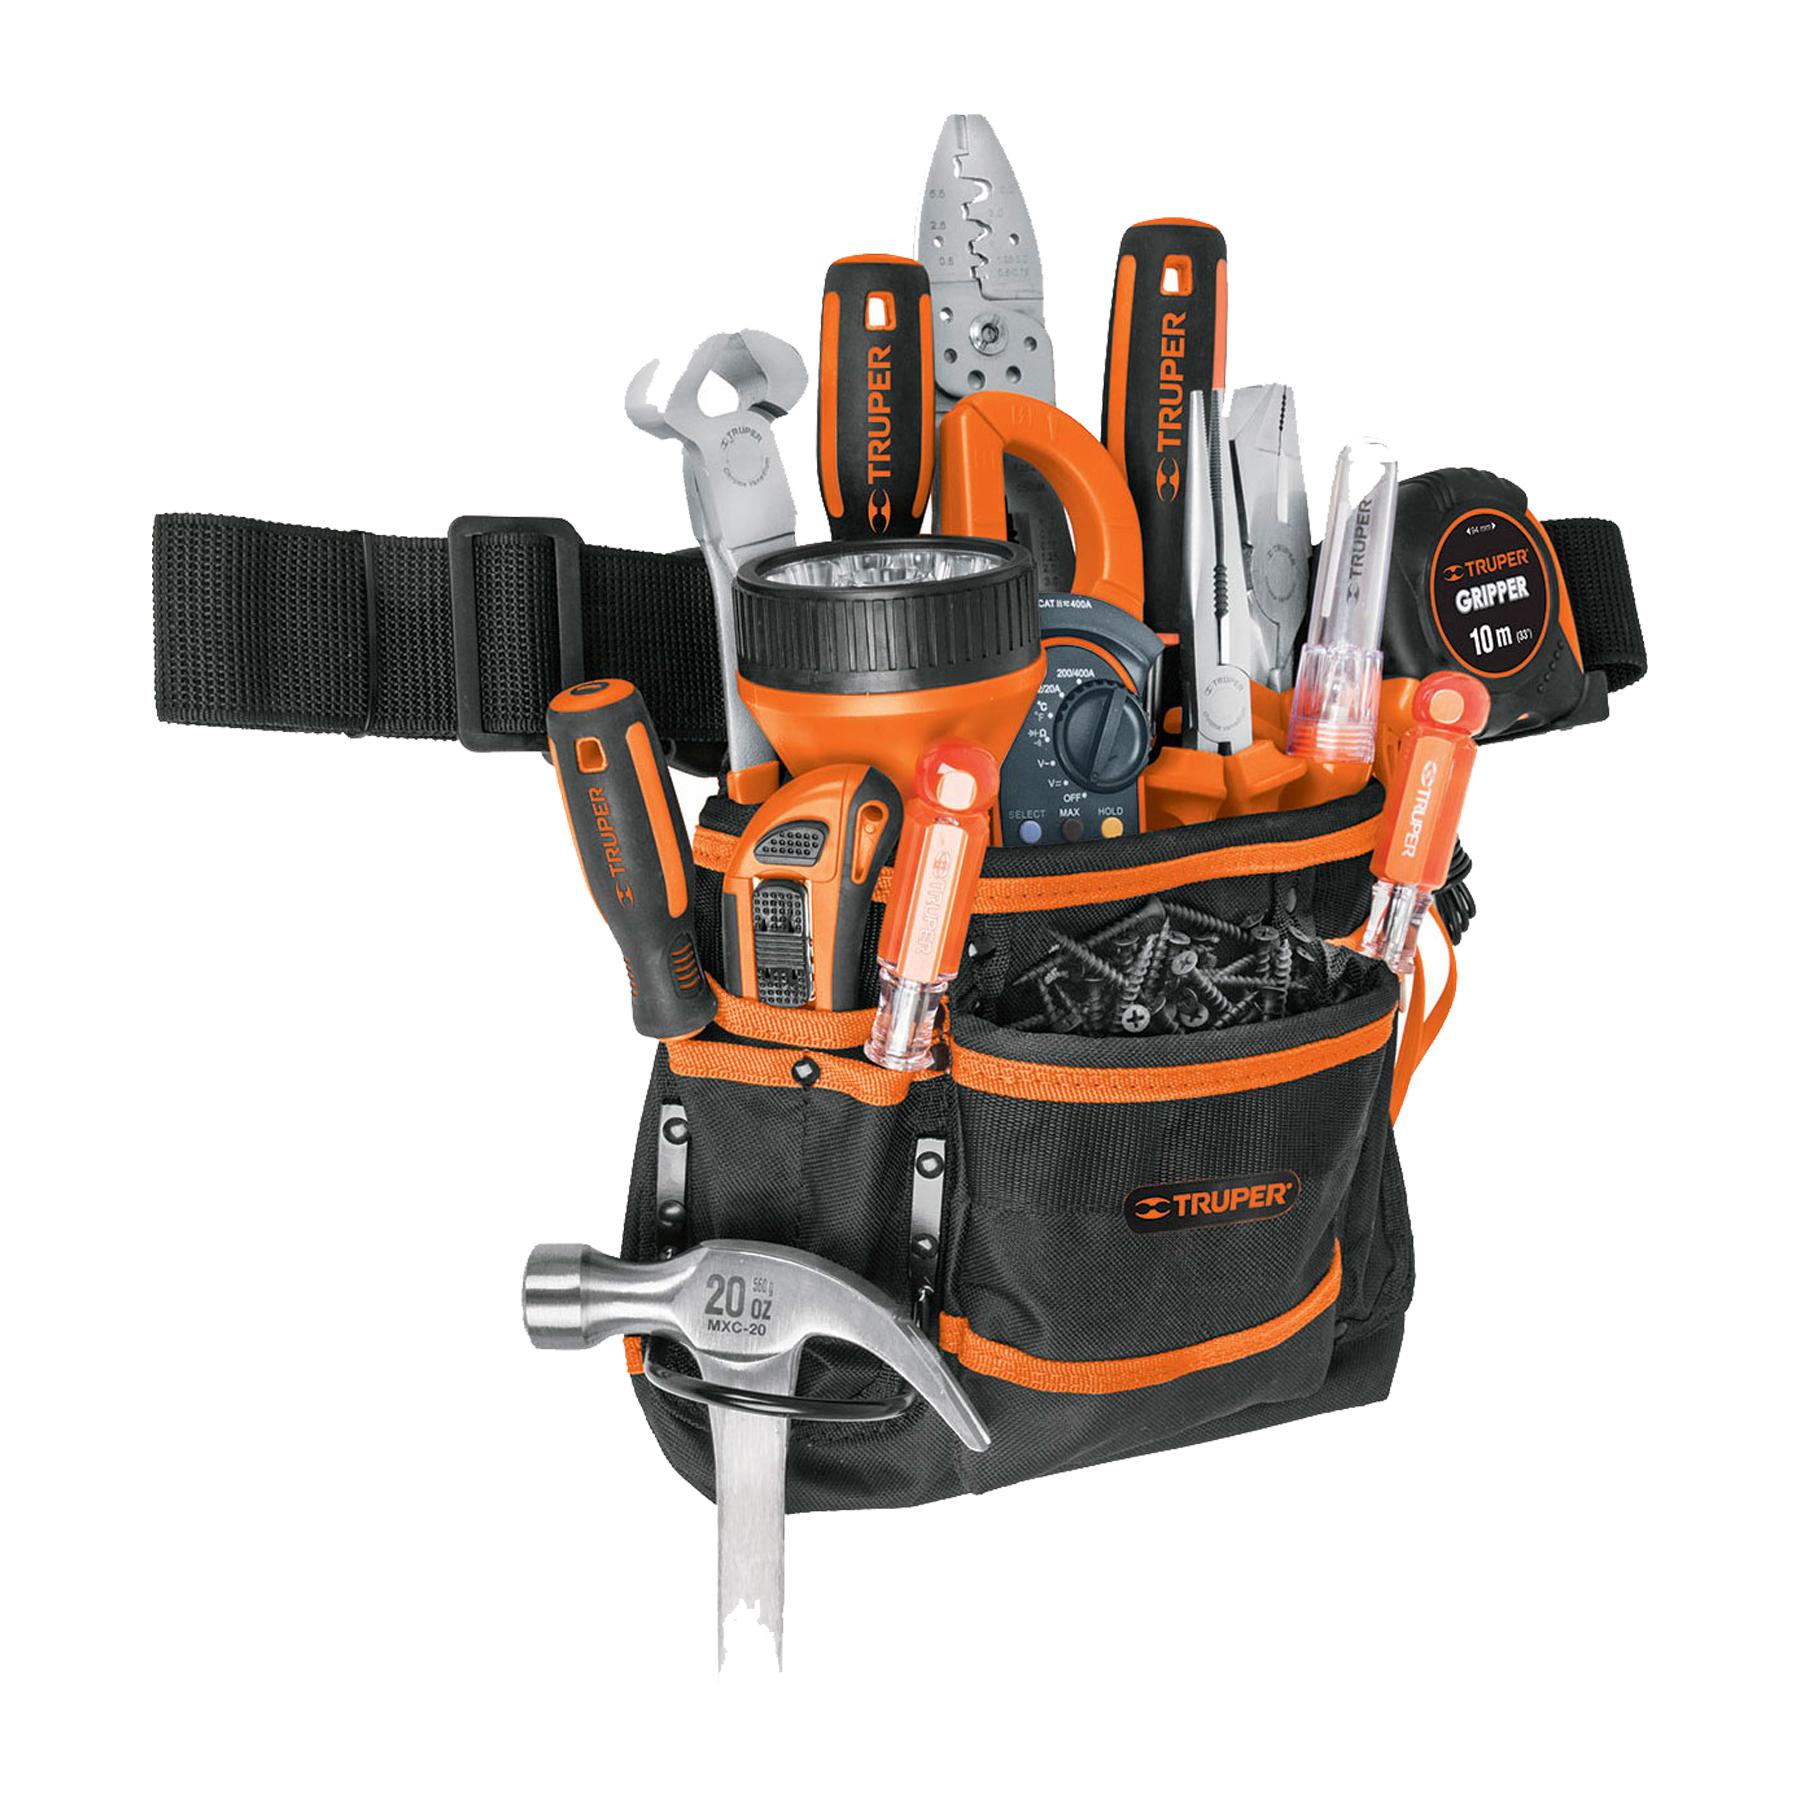 Truper - Porta herramientas de poliéster, 13 compartimentos